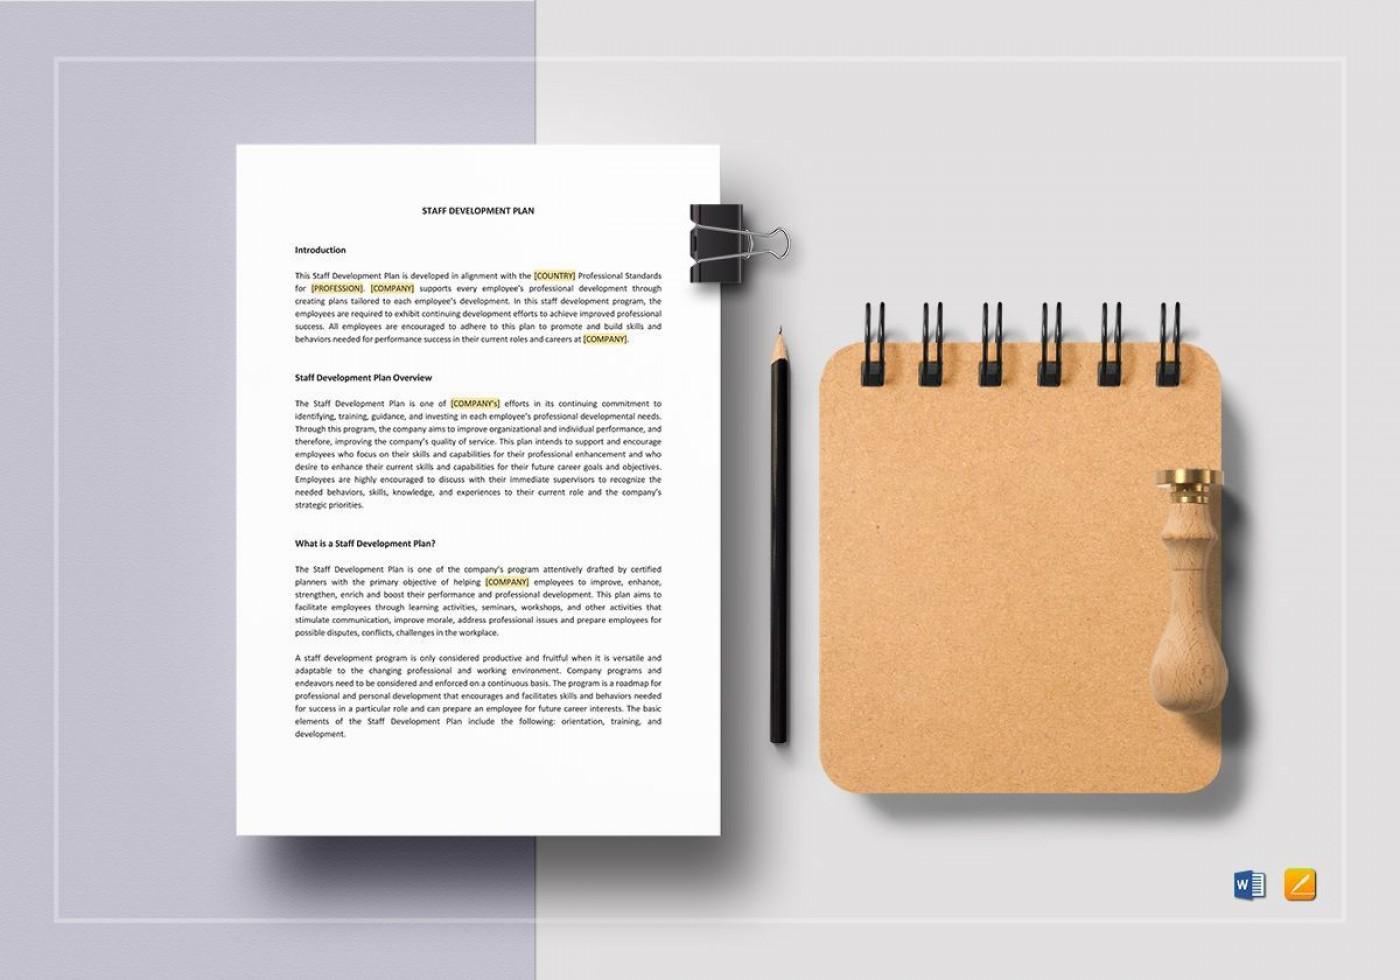 008 Unusual Professional Development Plan Template For Employee Idea  Example Sample1400